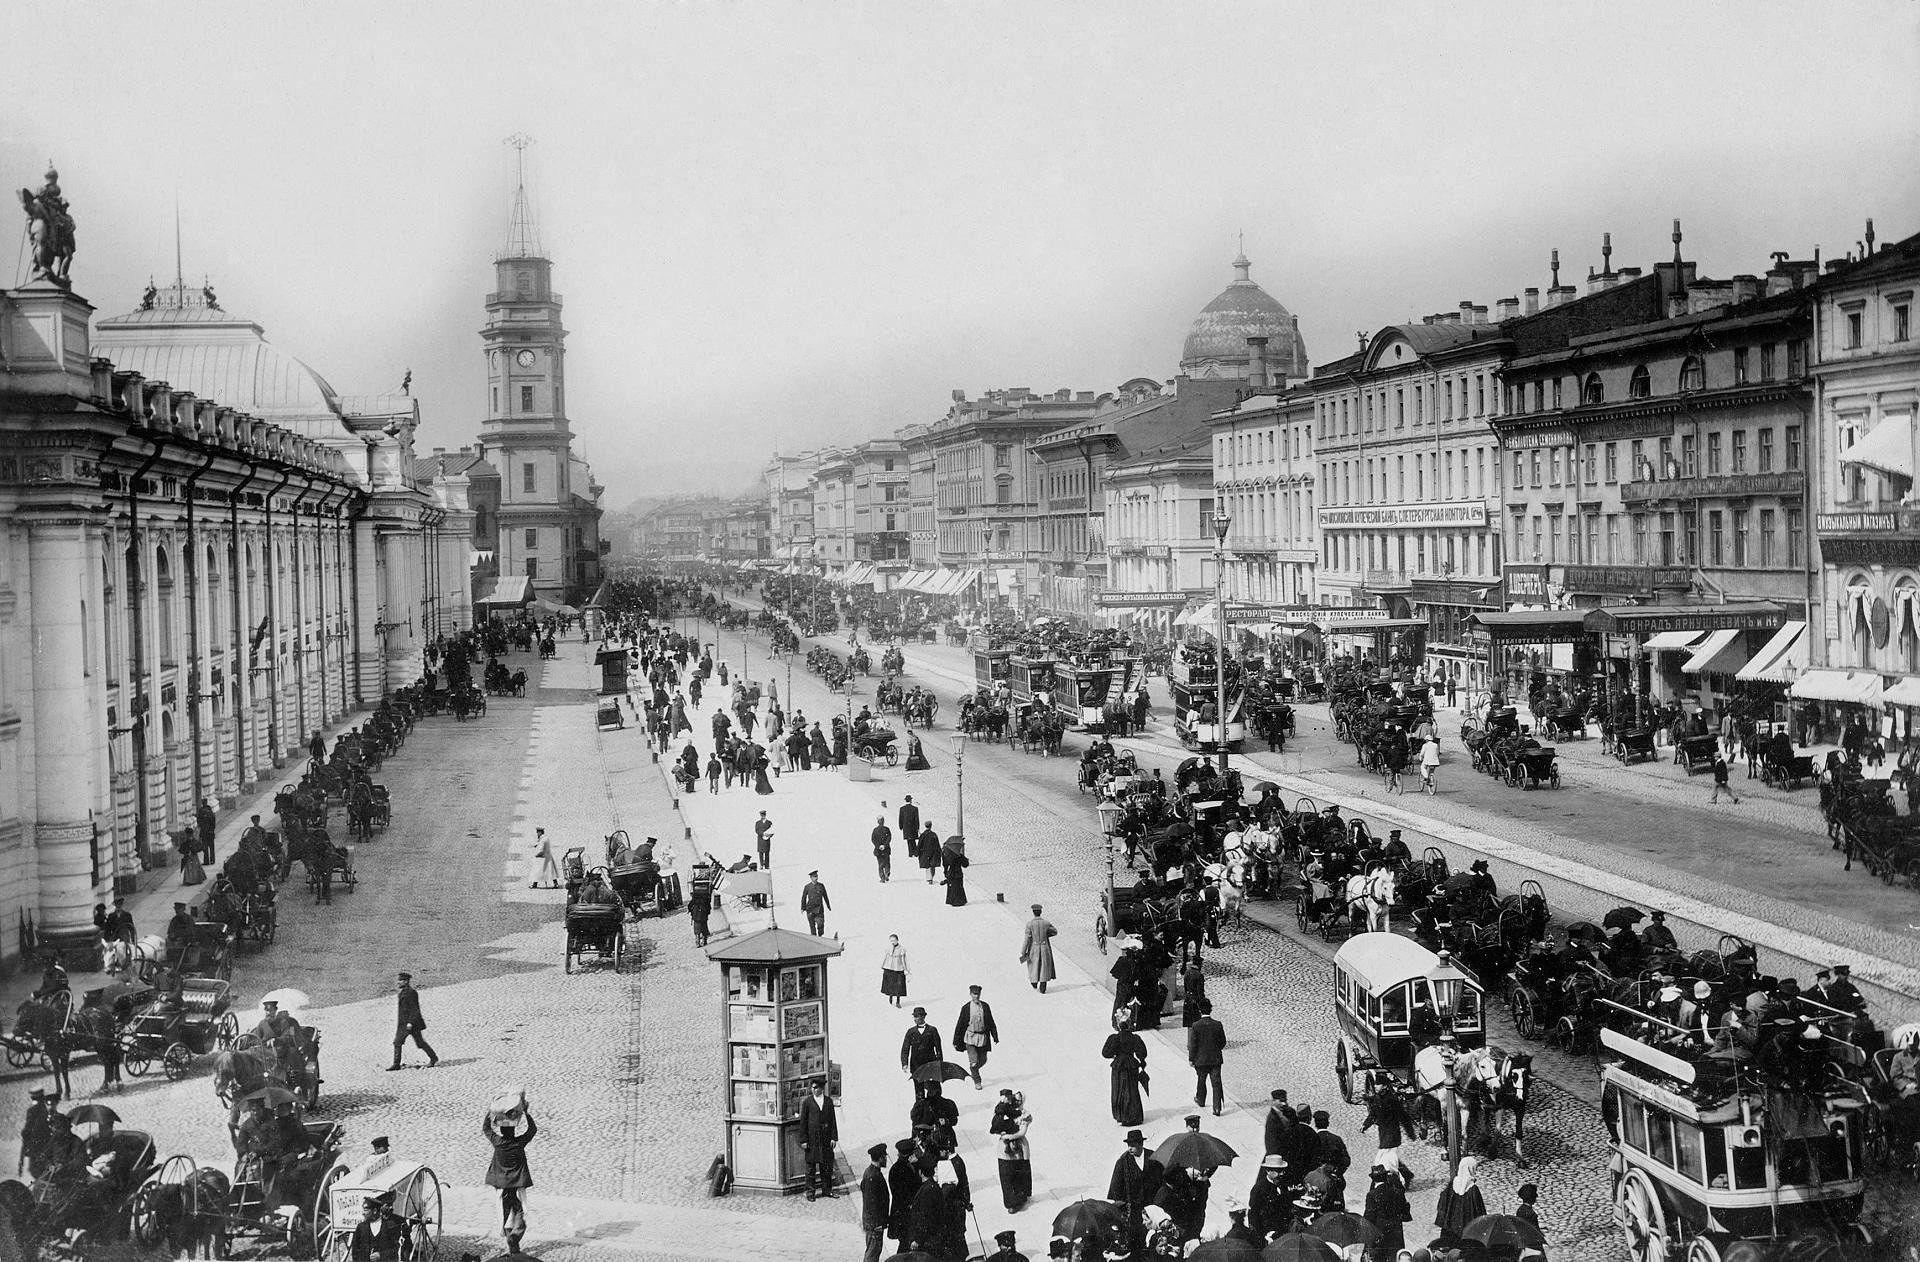 San Petersburgo a finales del siglo XIX.